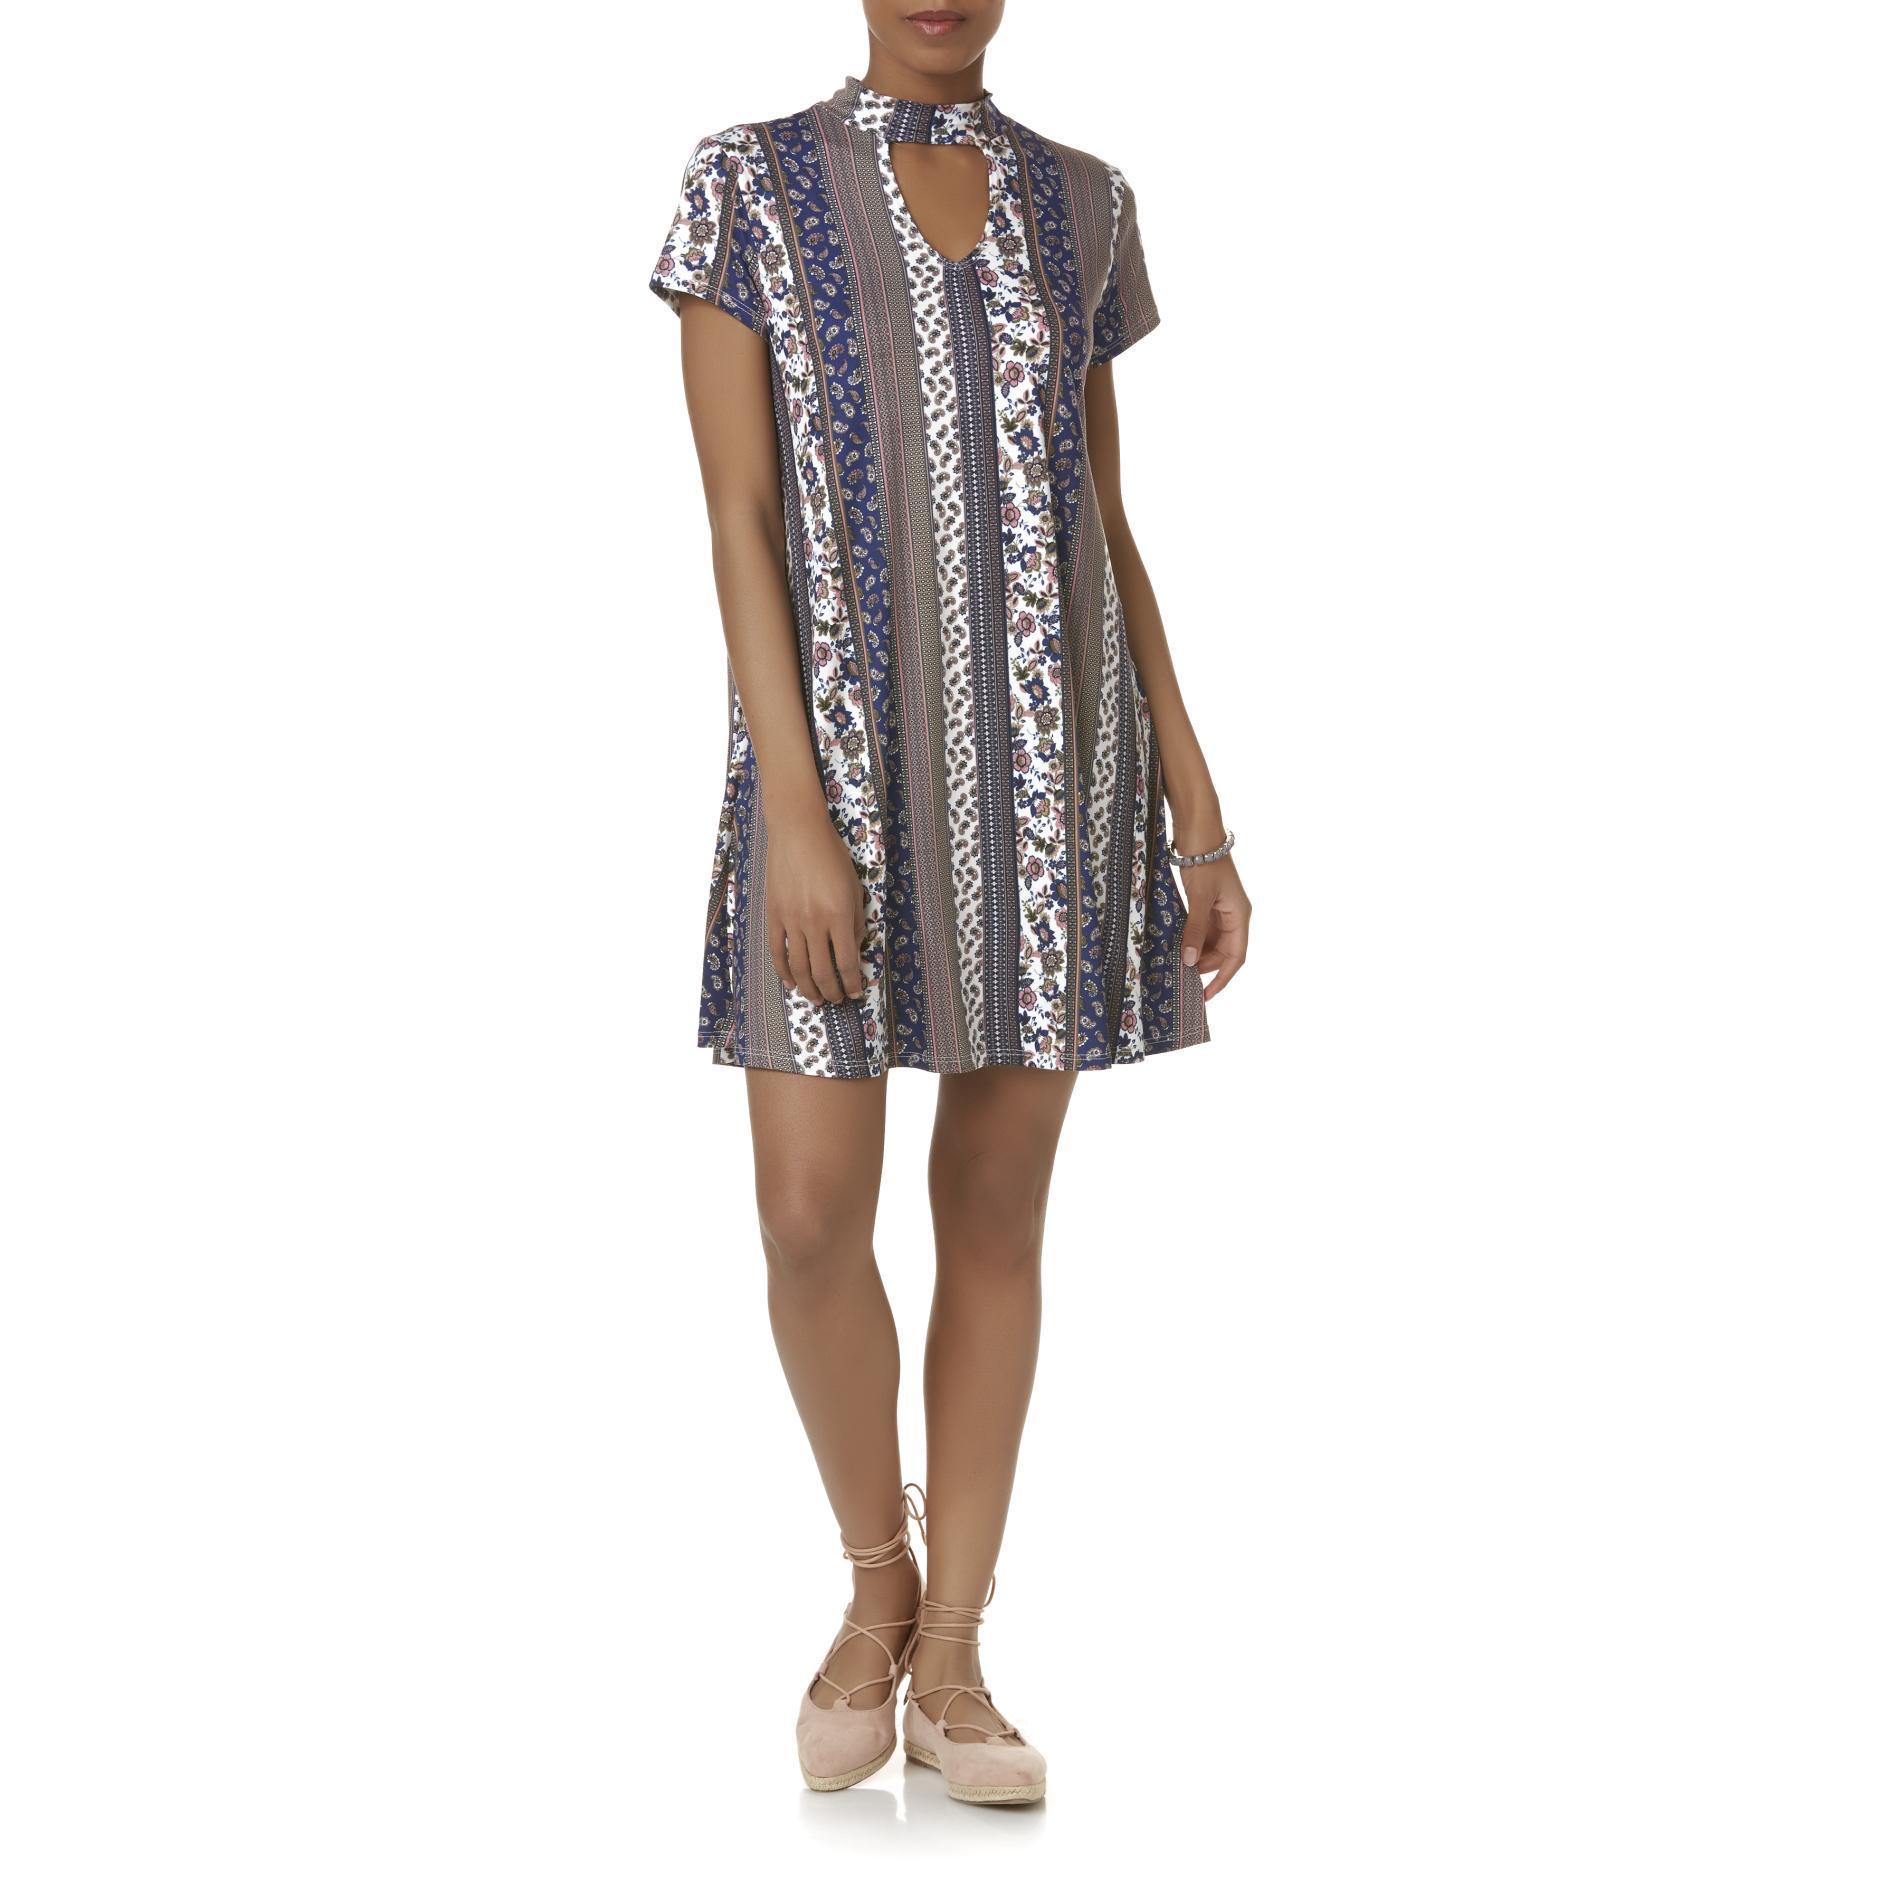 Underwear & Sleepwears Women Skin-friendly Elastic Soft Spaghetti Strap Sleepwear Home Comfy Nightgowns Modal Breathable Padded Night Dress Top Quality Exquisite Craftsmanship;